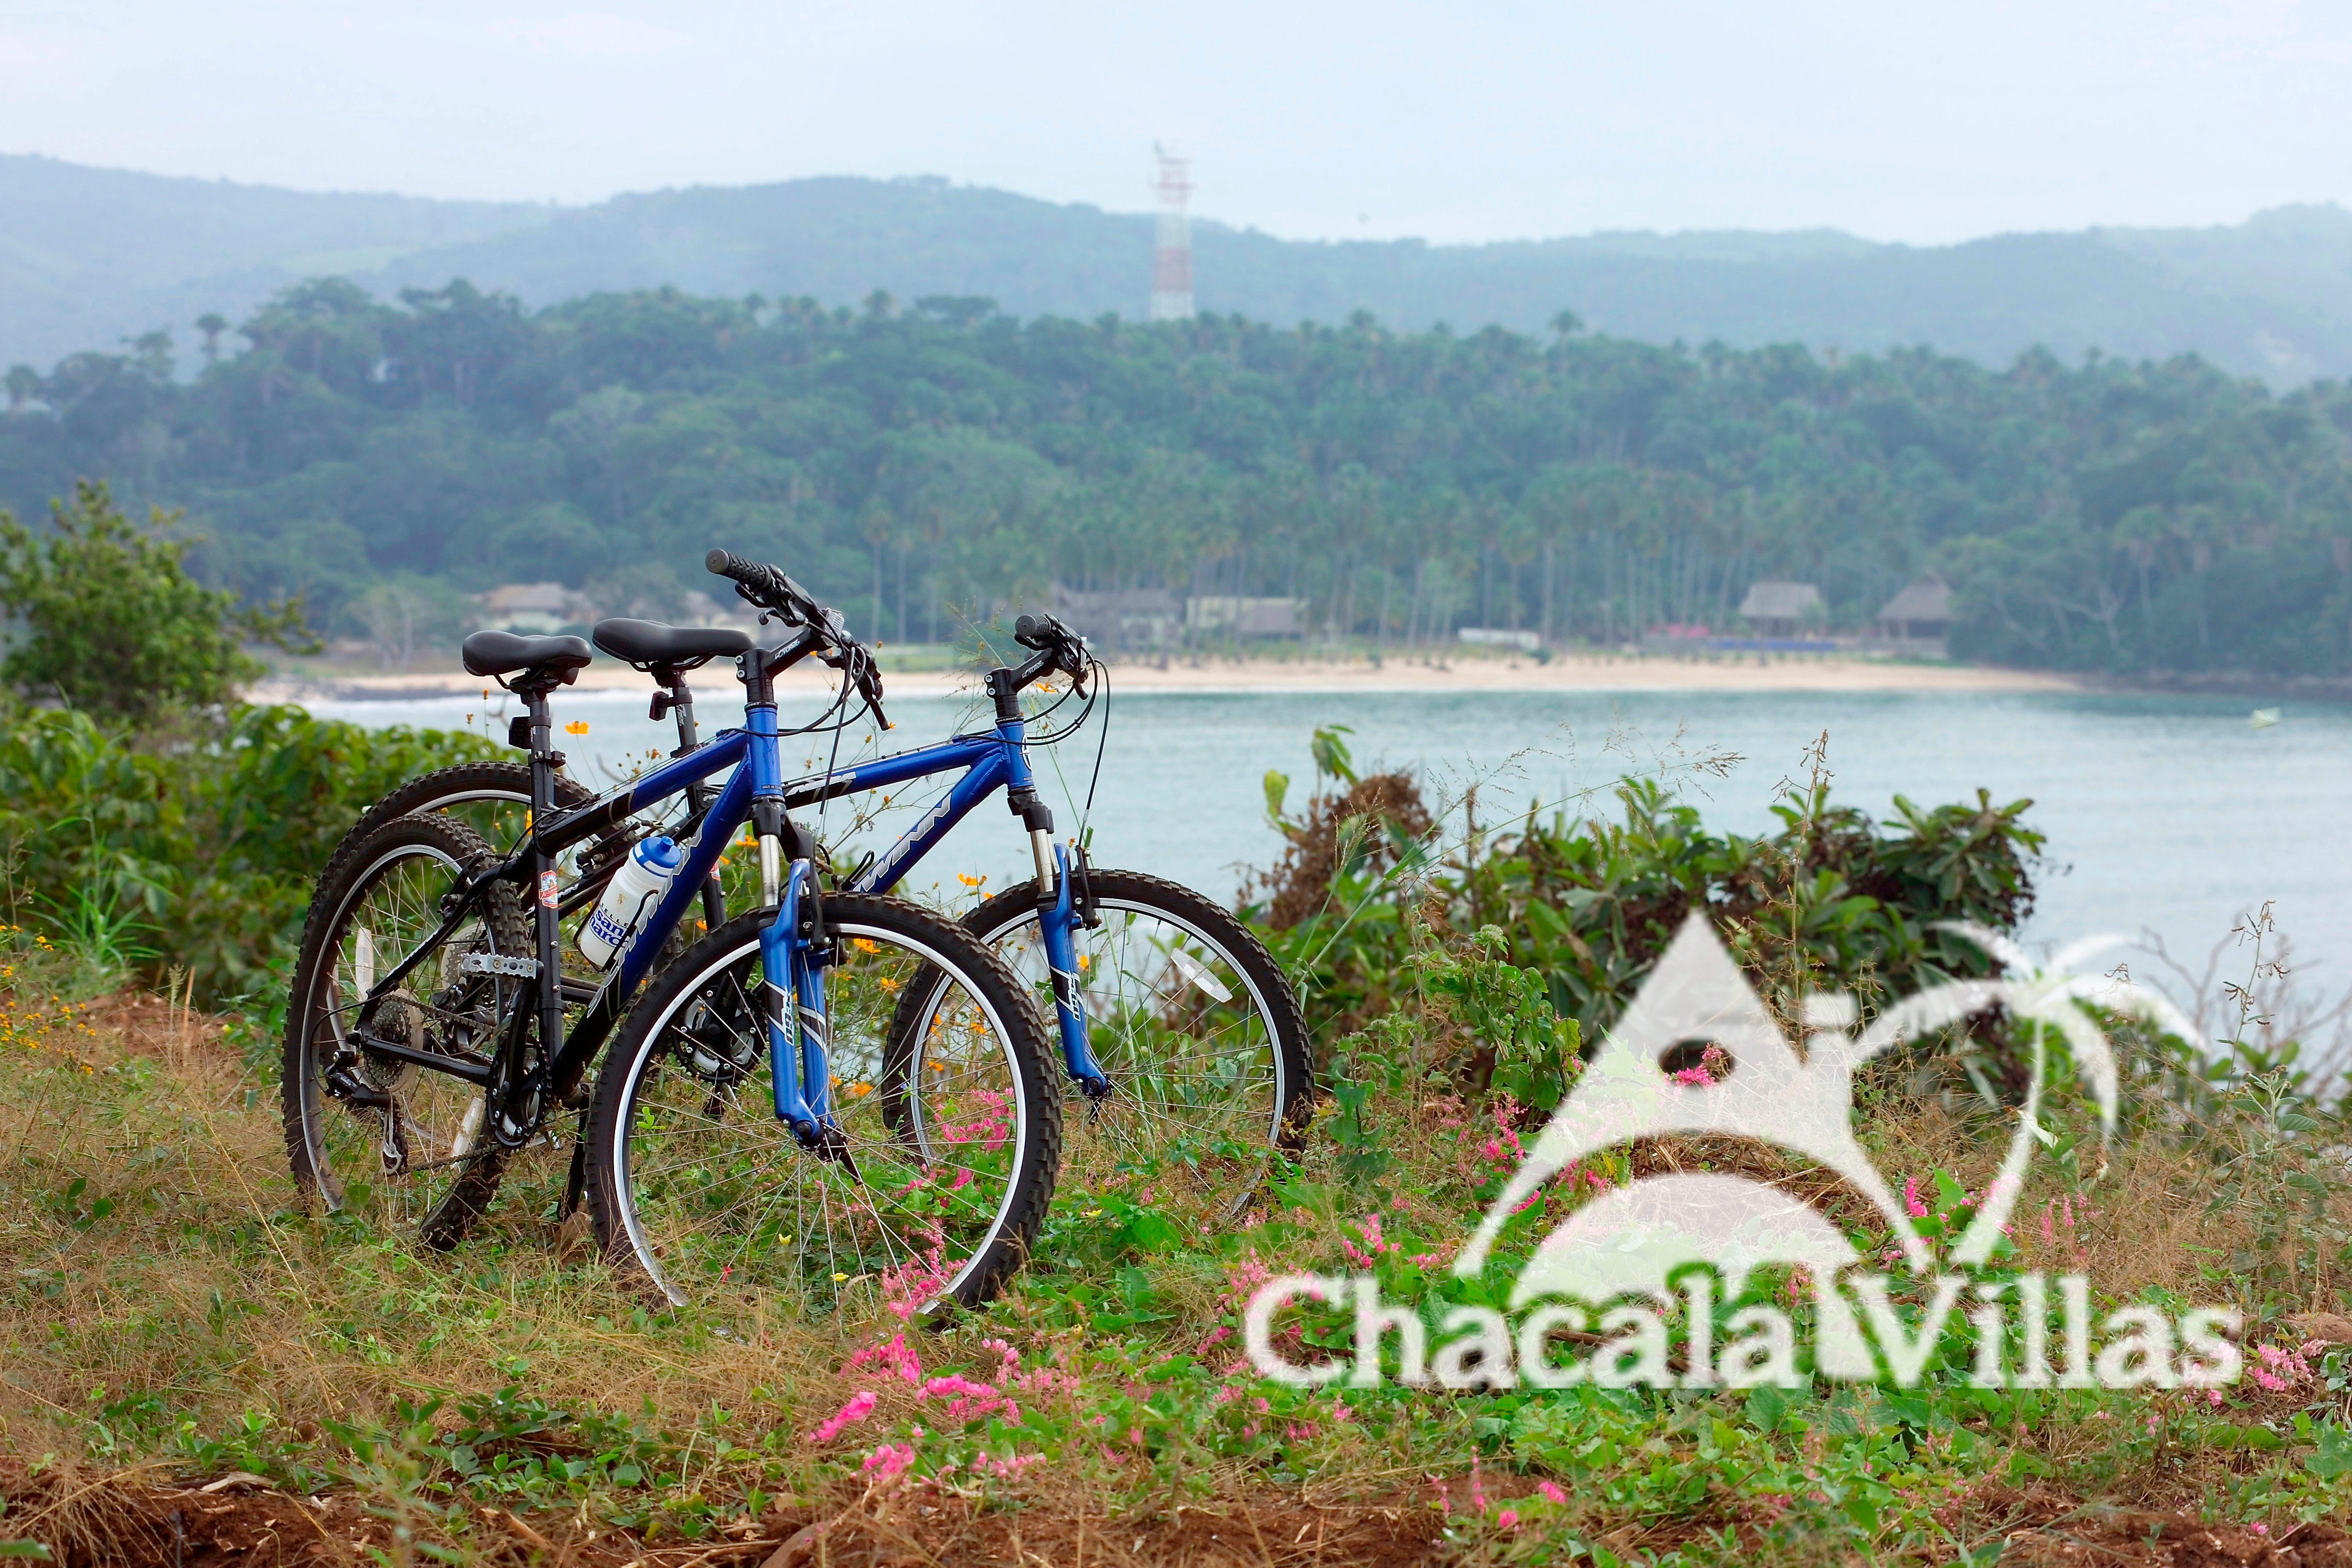 Marina-chacala-View--CHV-logo-web